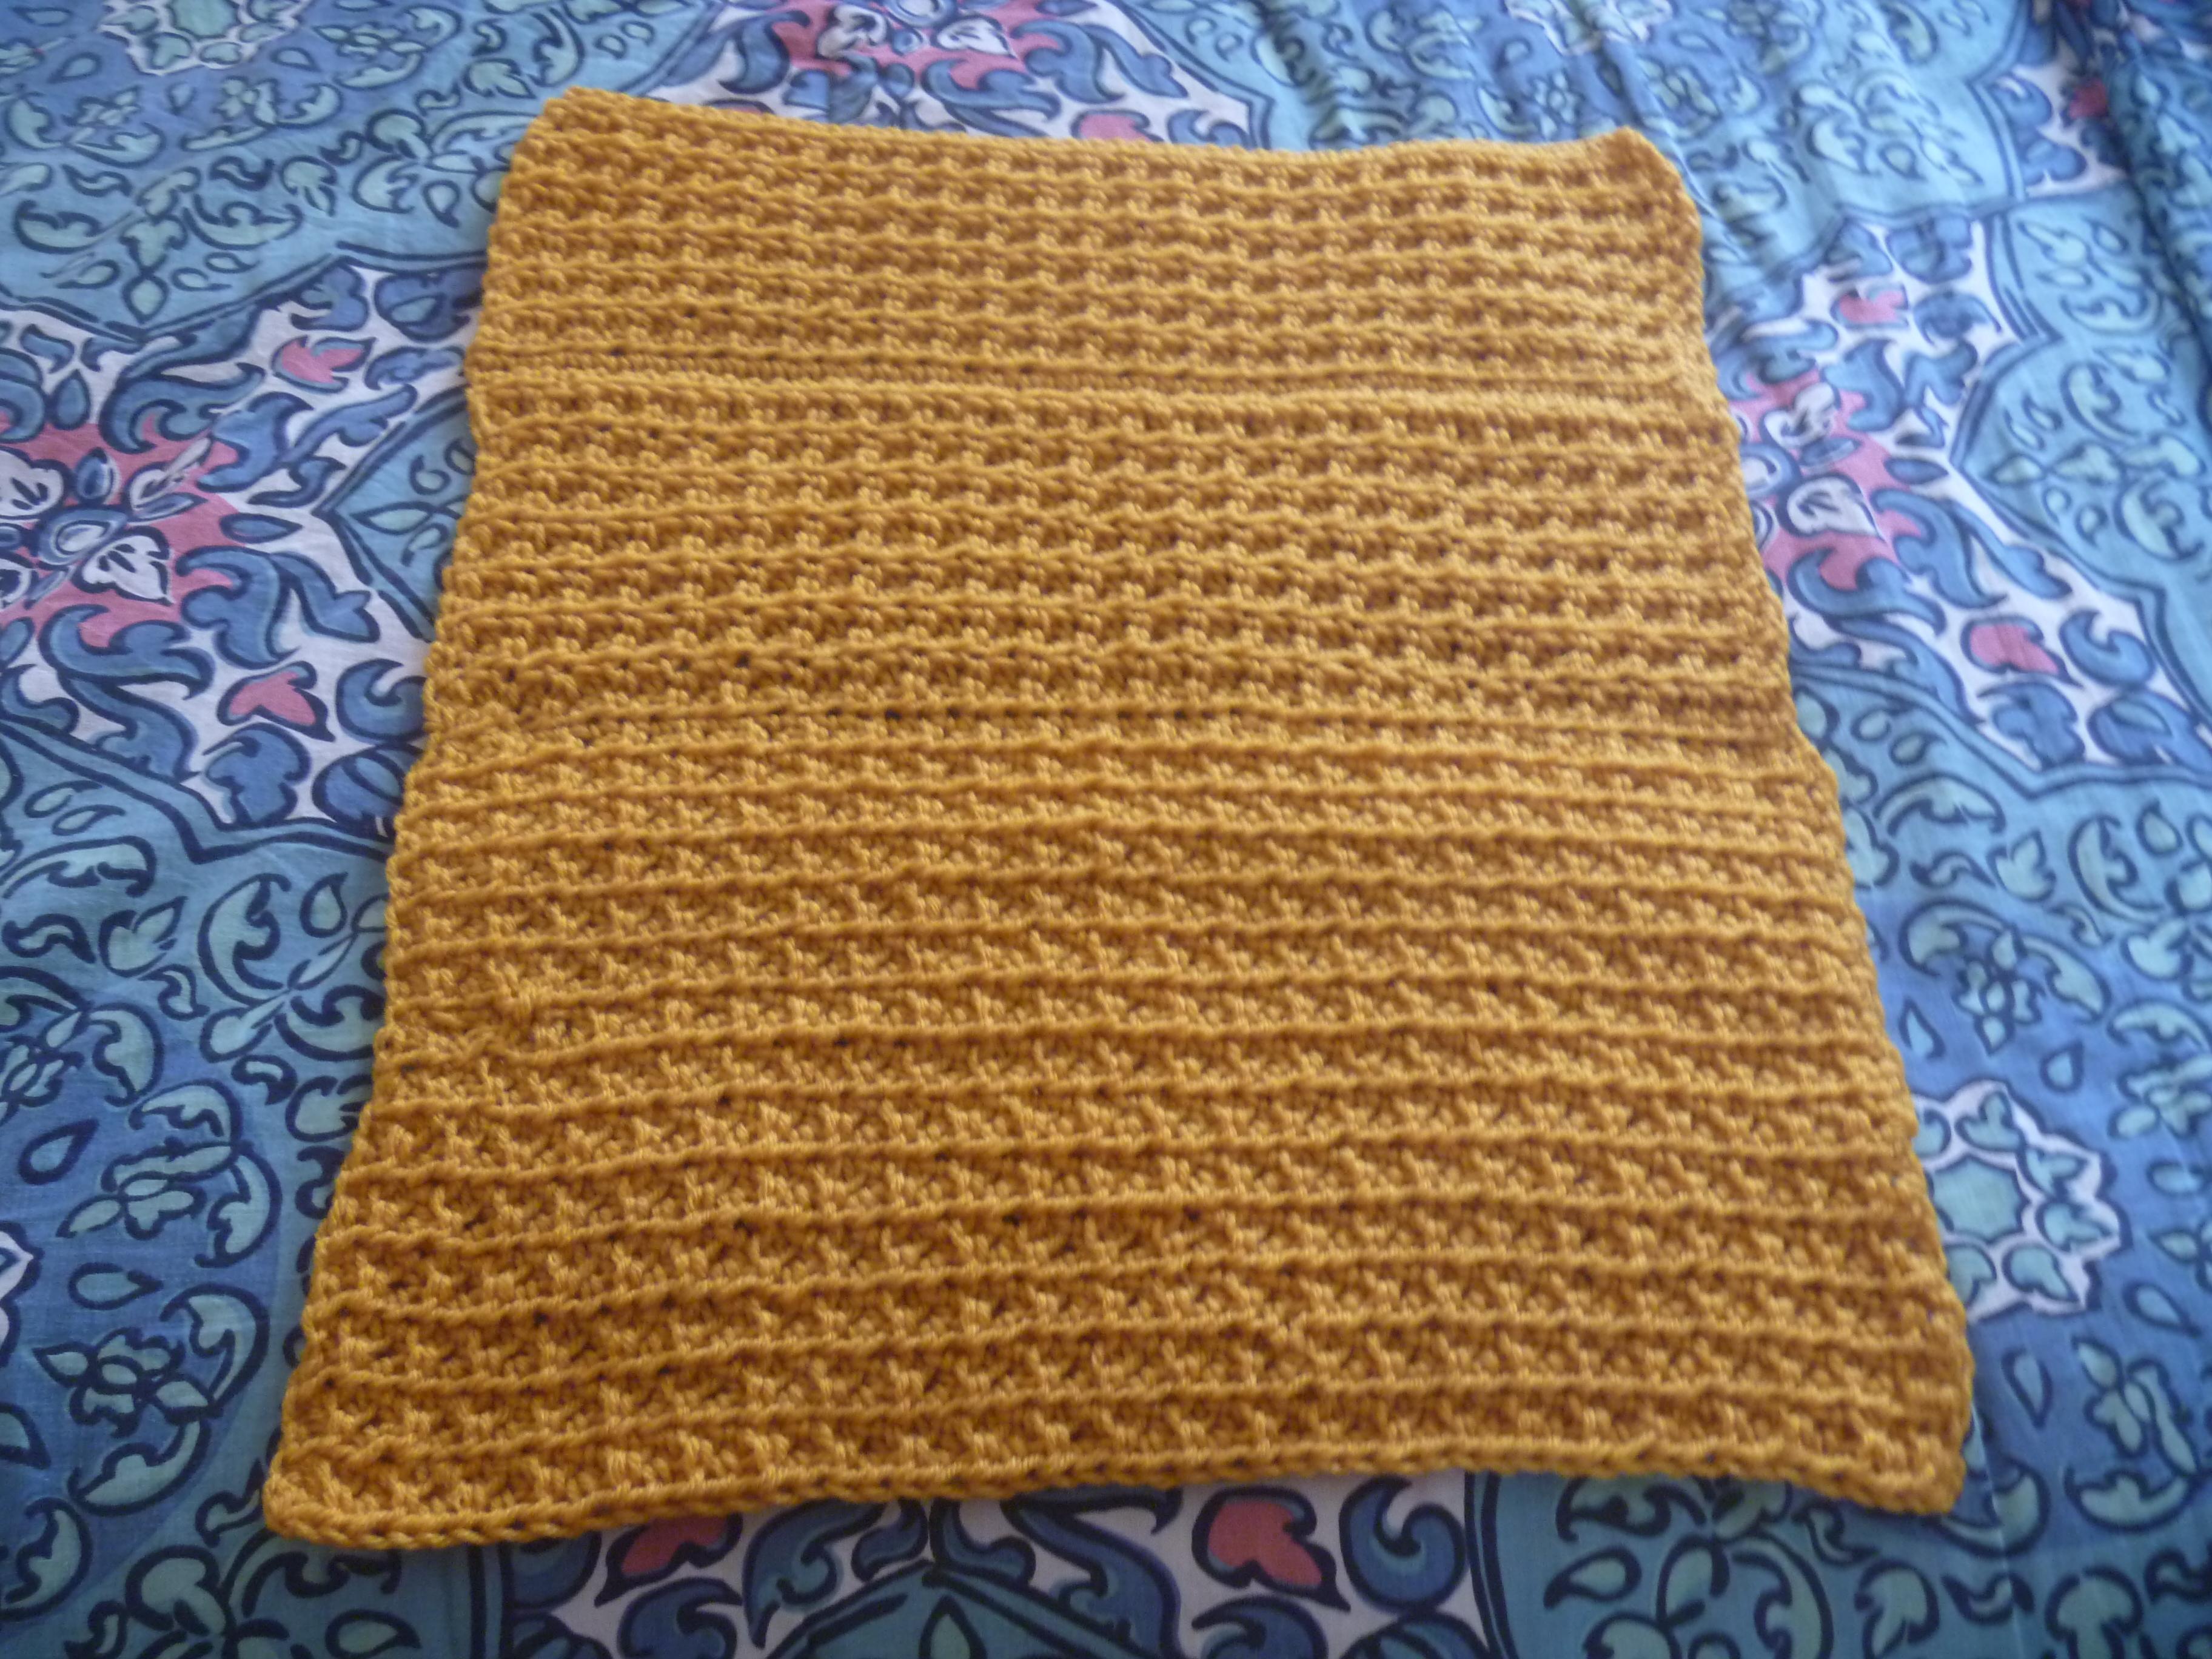 semi-rectangular block of crochet